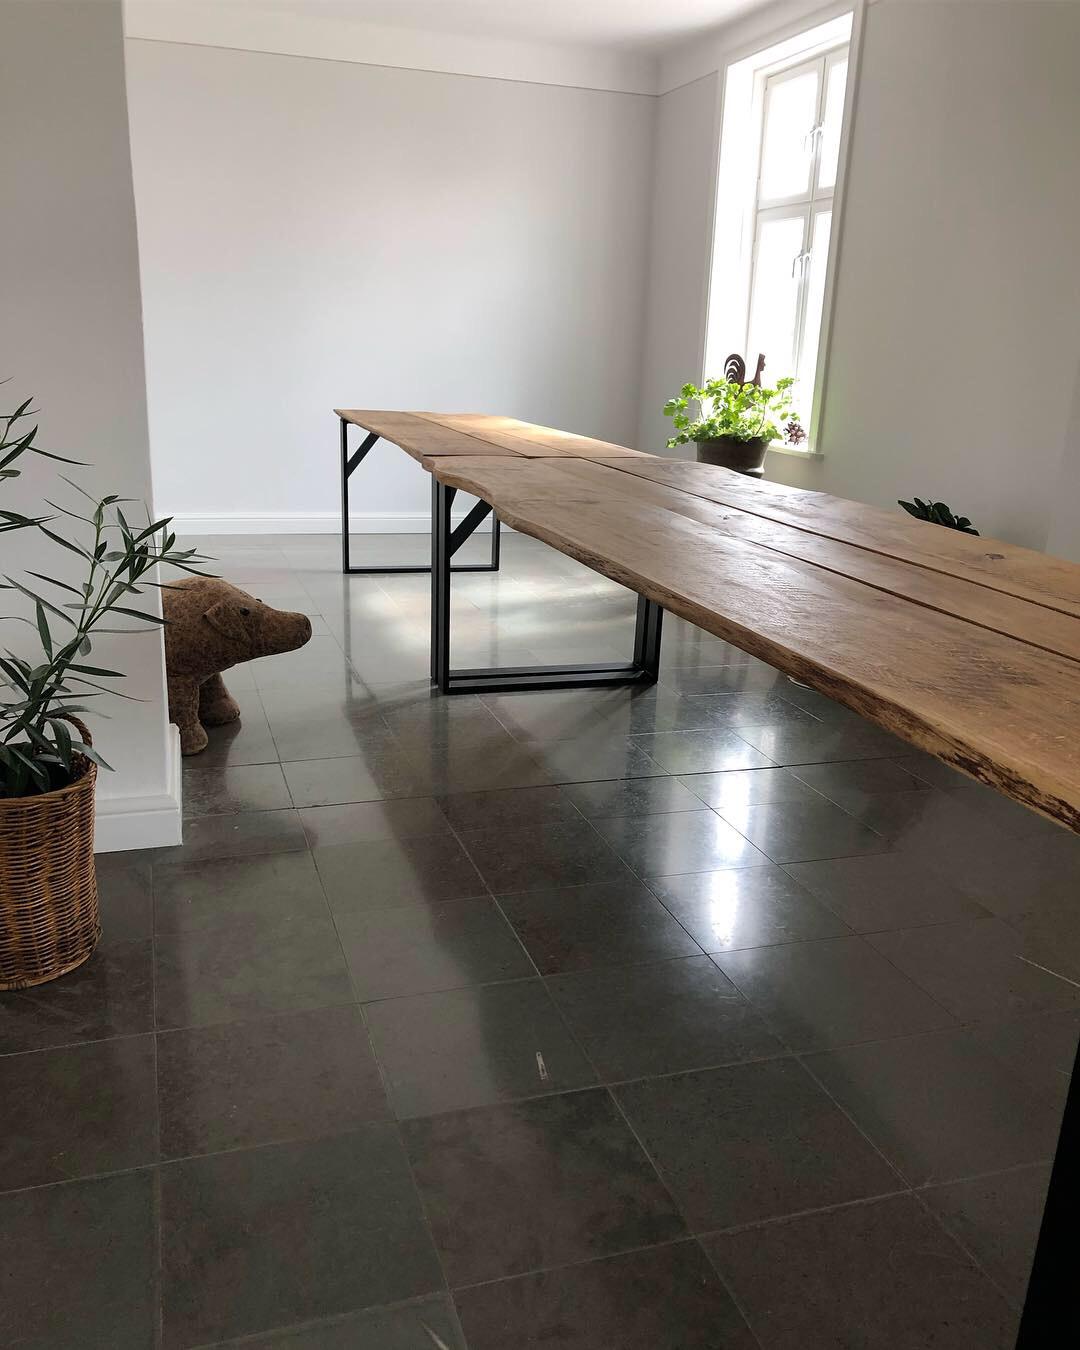 7 meter okantade ekbord med järnunderrede - Borensberg